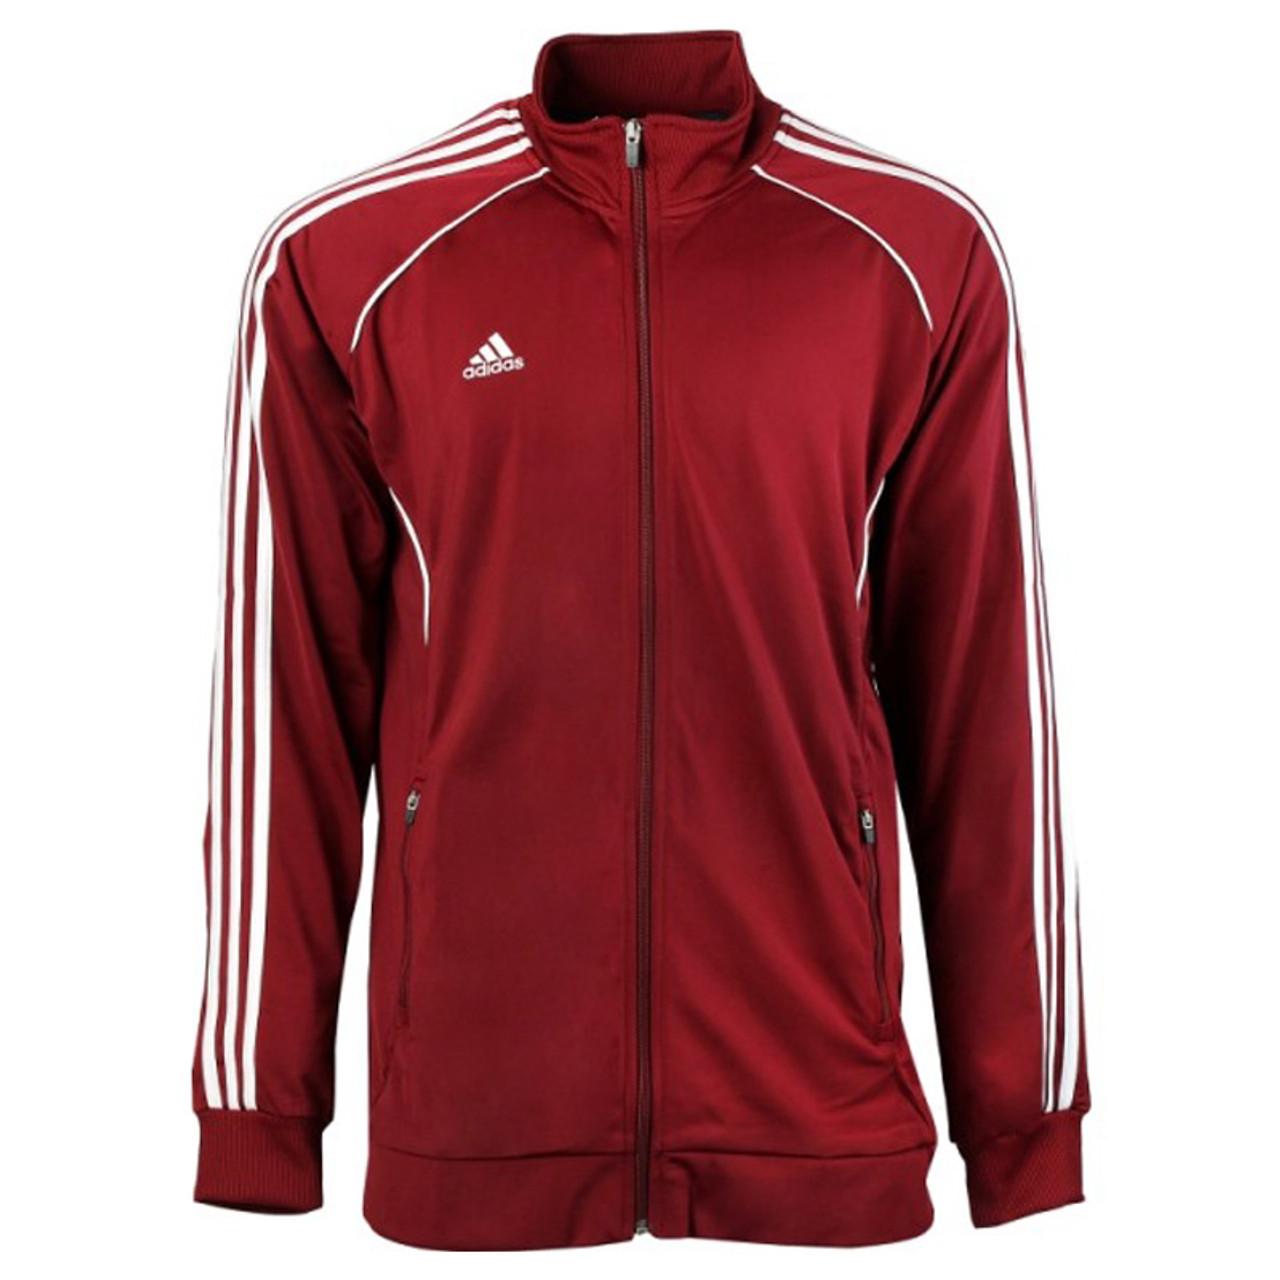 7937a38e54 Adidas Mens Performance Basic Jacket - Maroon/White